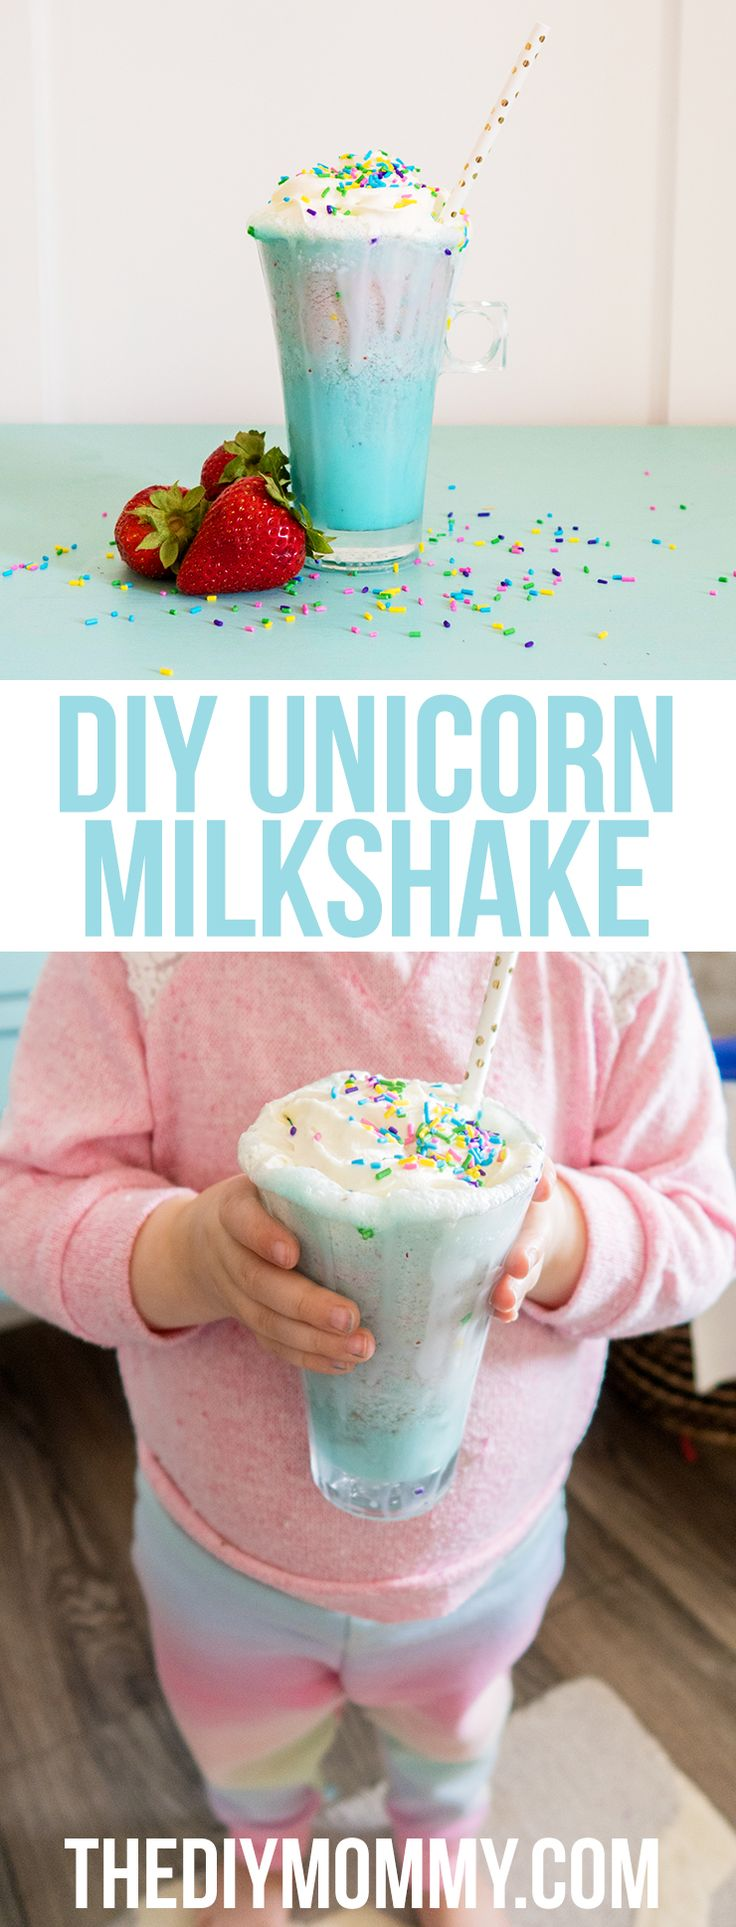 So easy and fun! DIY unicorn milkshake recipe with video tutorial